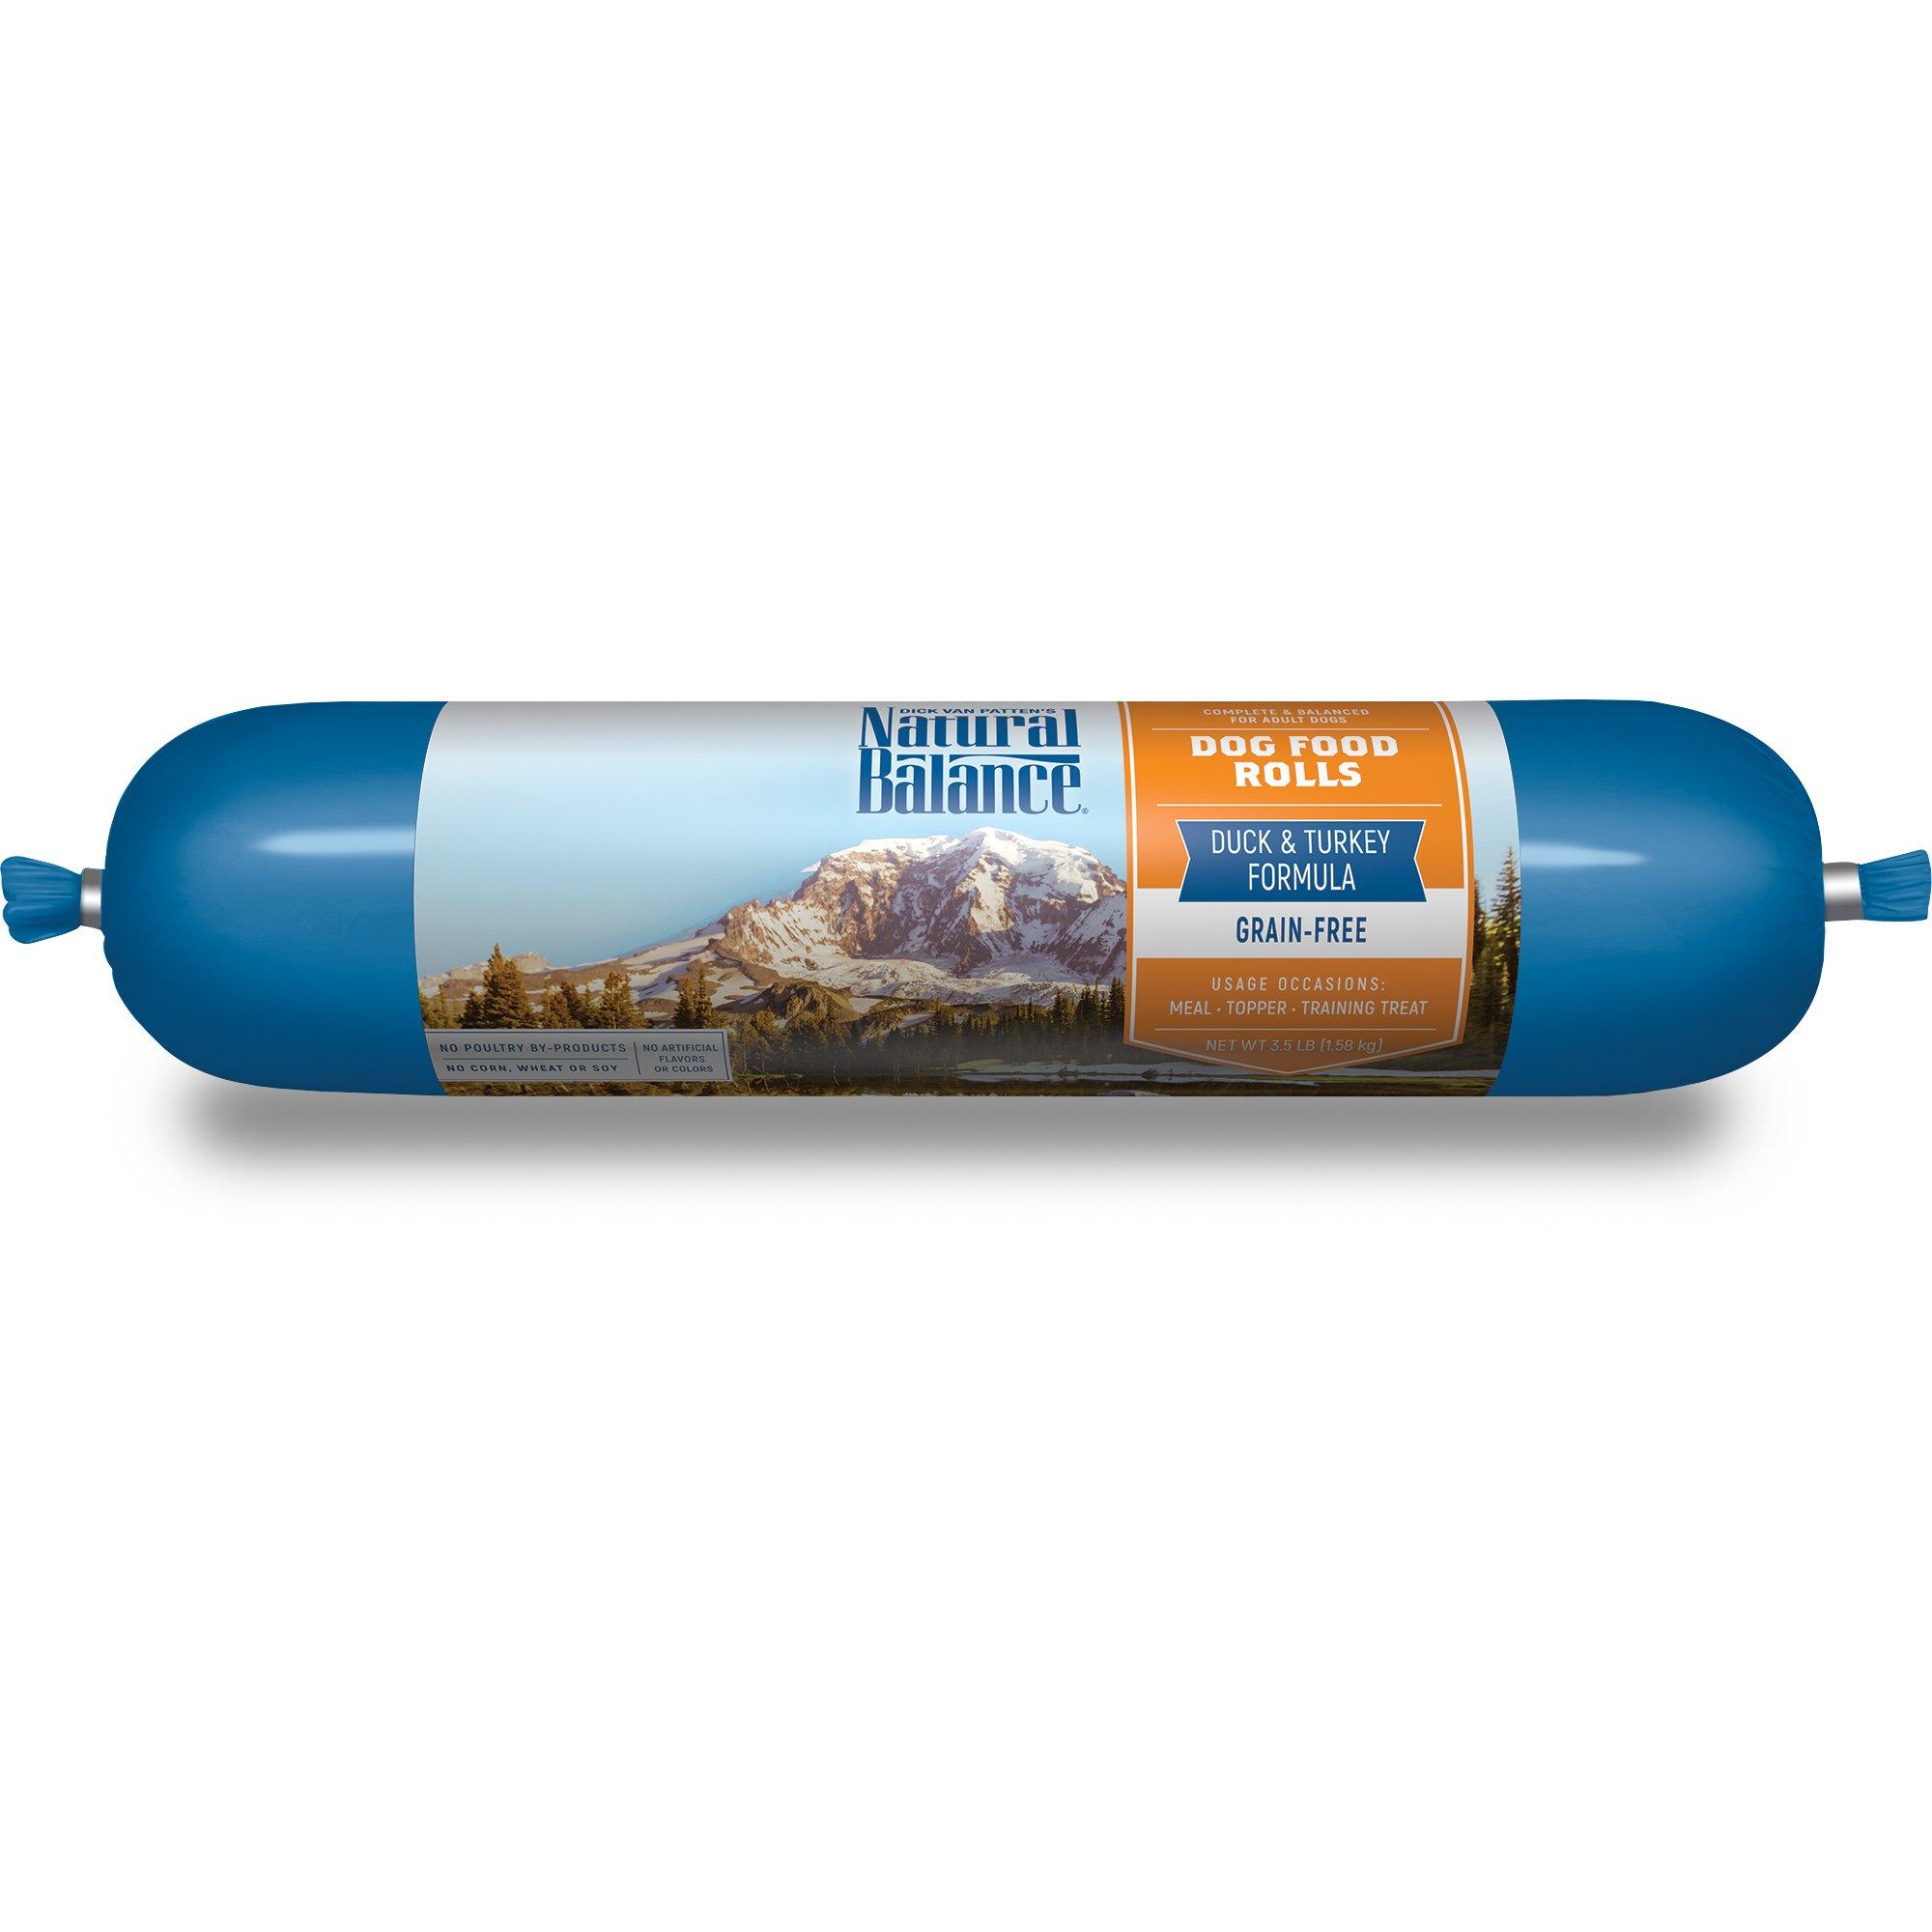 Natural Balance Duck & Turkey Formula Dog Food Rolls